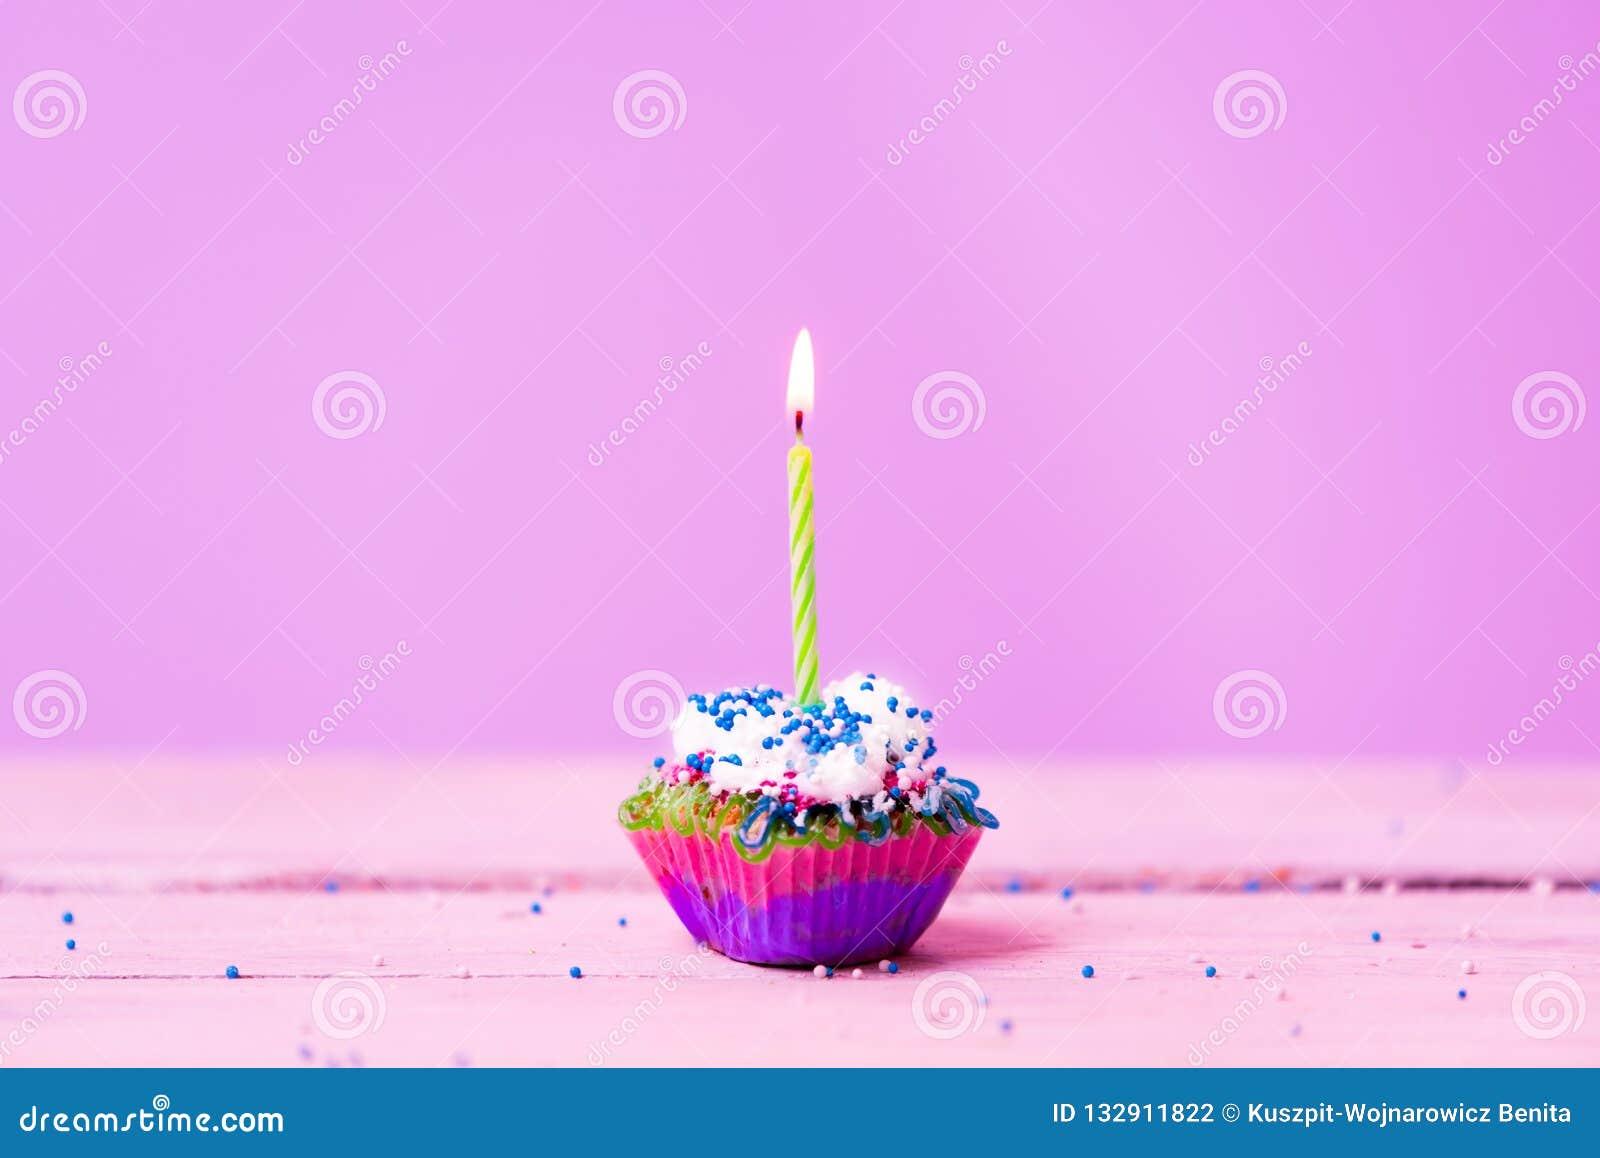 Aniversário mindinho feliz